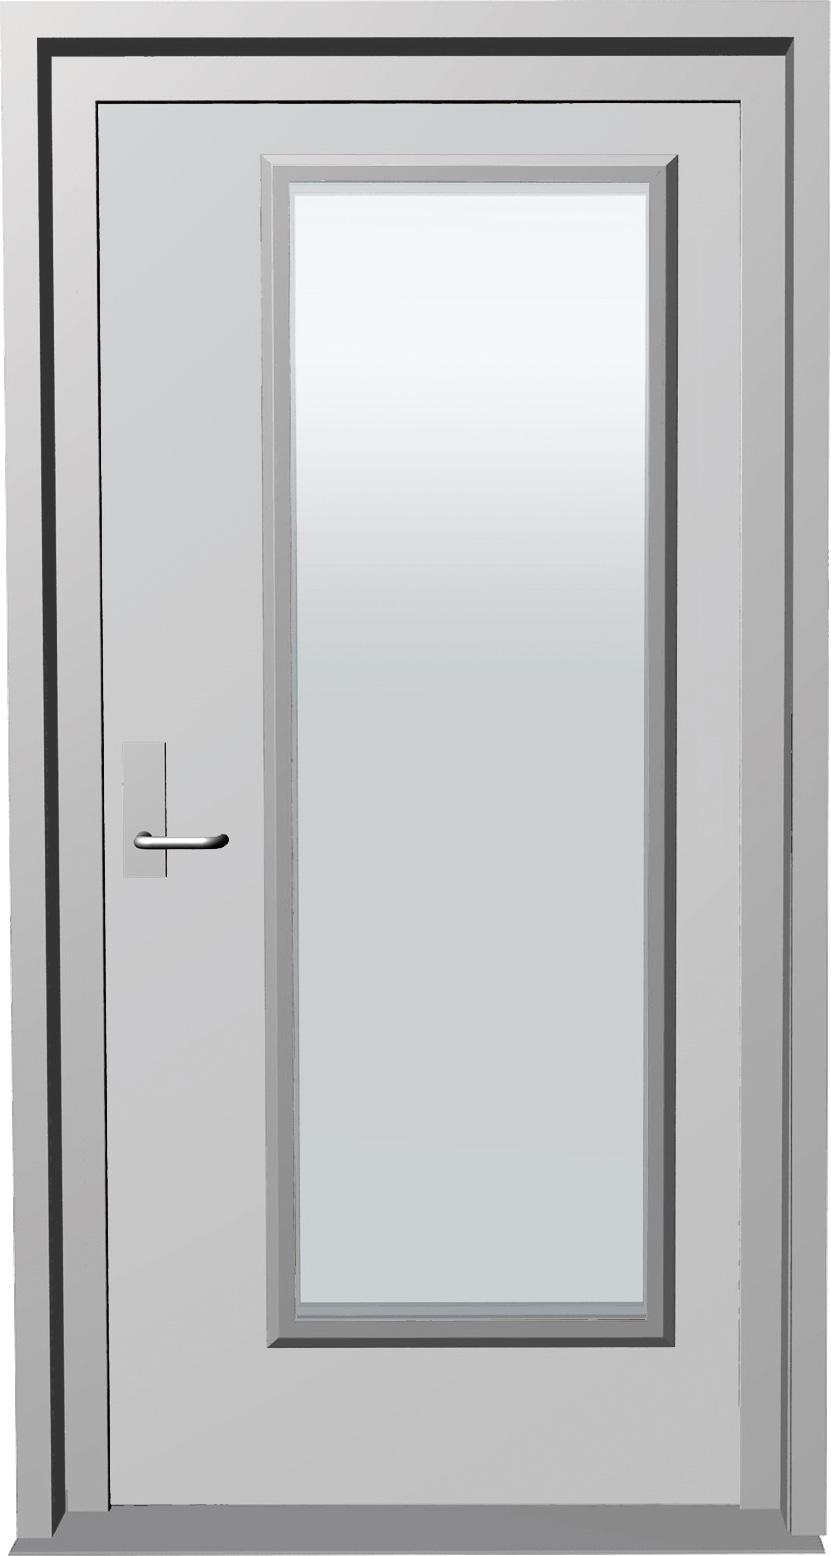 Acoustical Doors Wenger